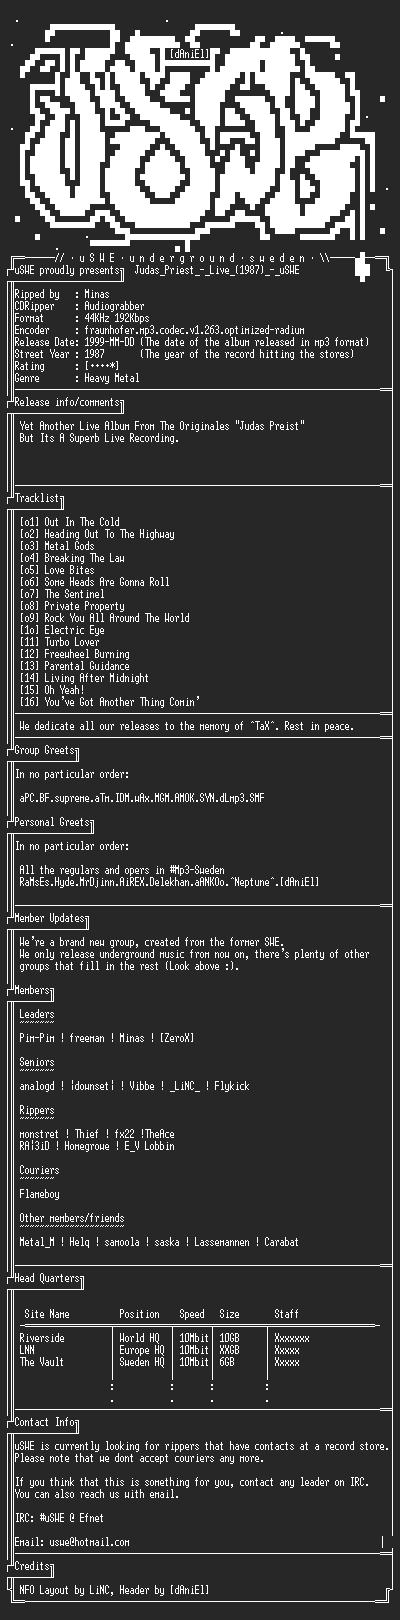 NFO file for Judas_Priest_-_Live_(1987)_-_uSWE